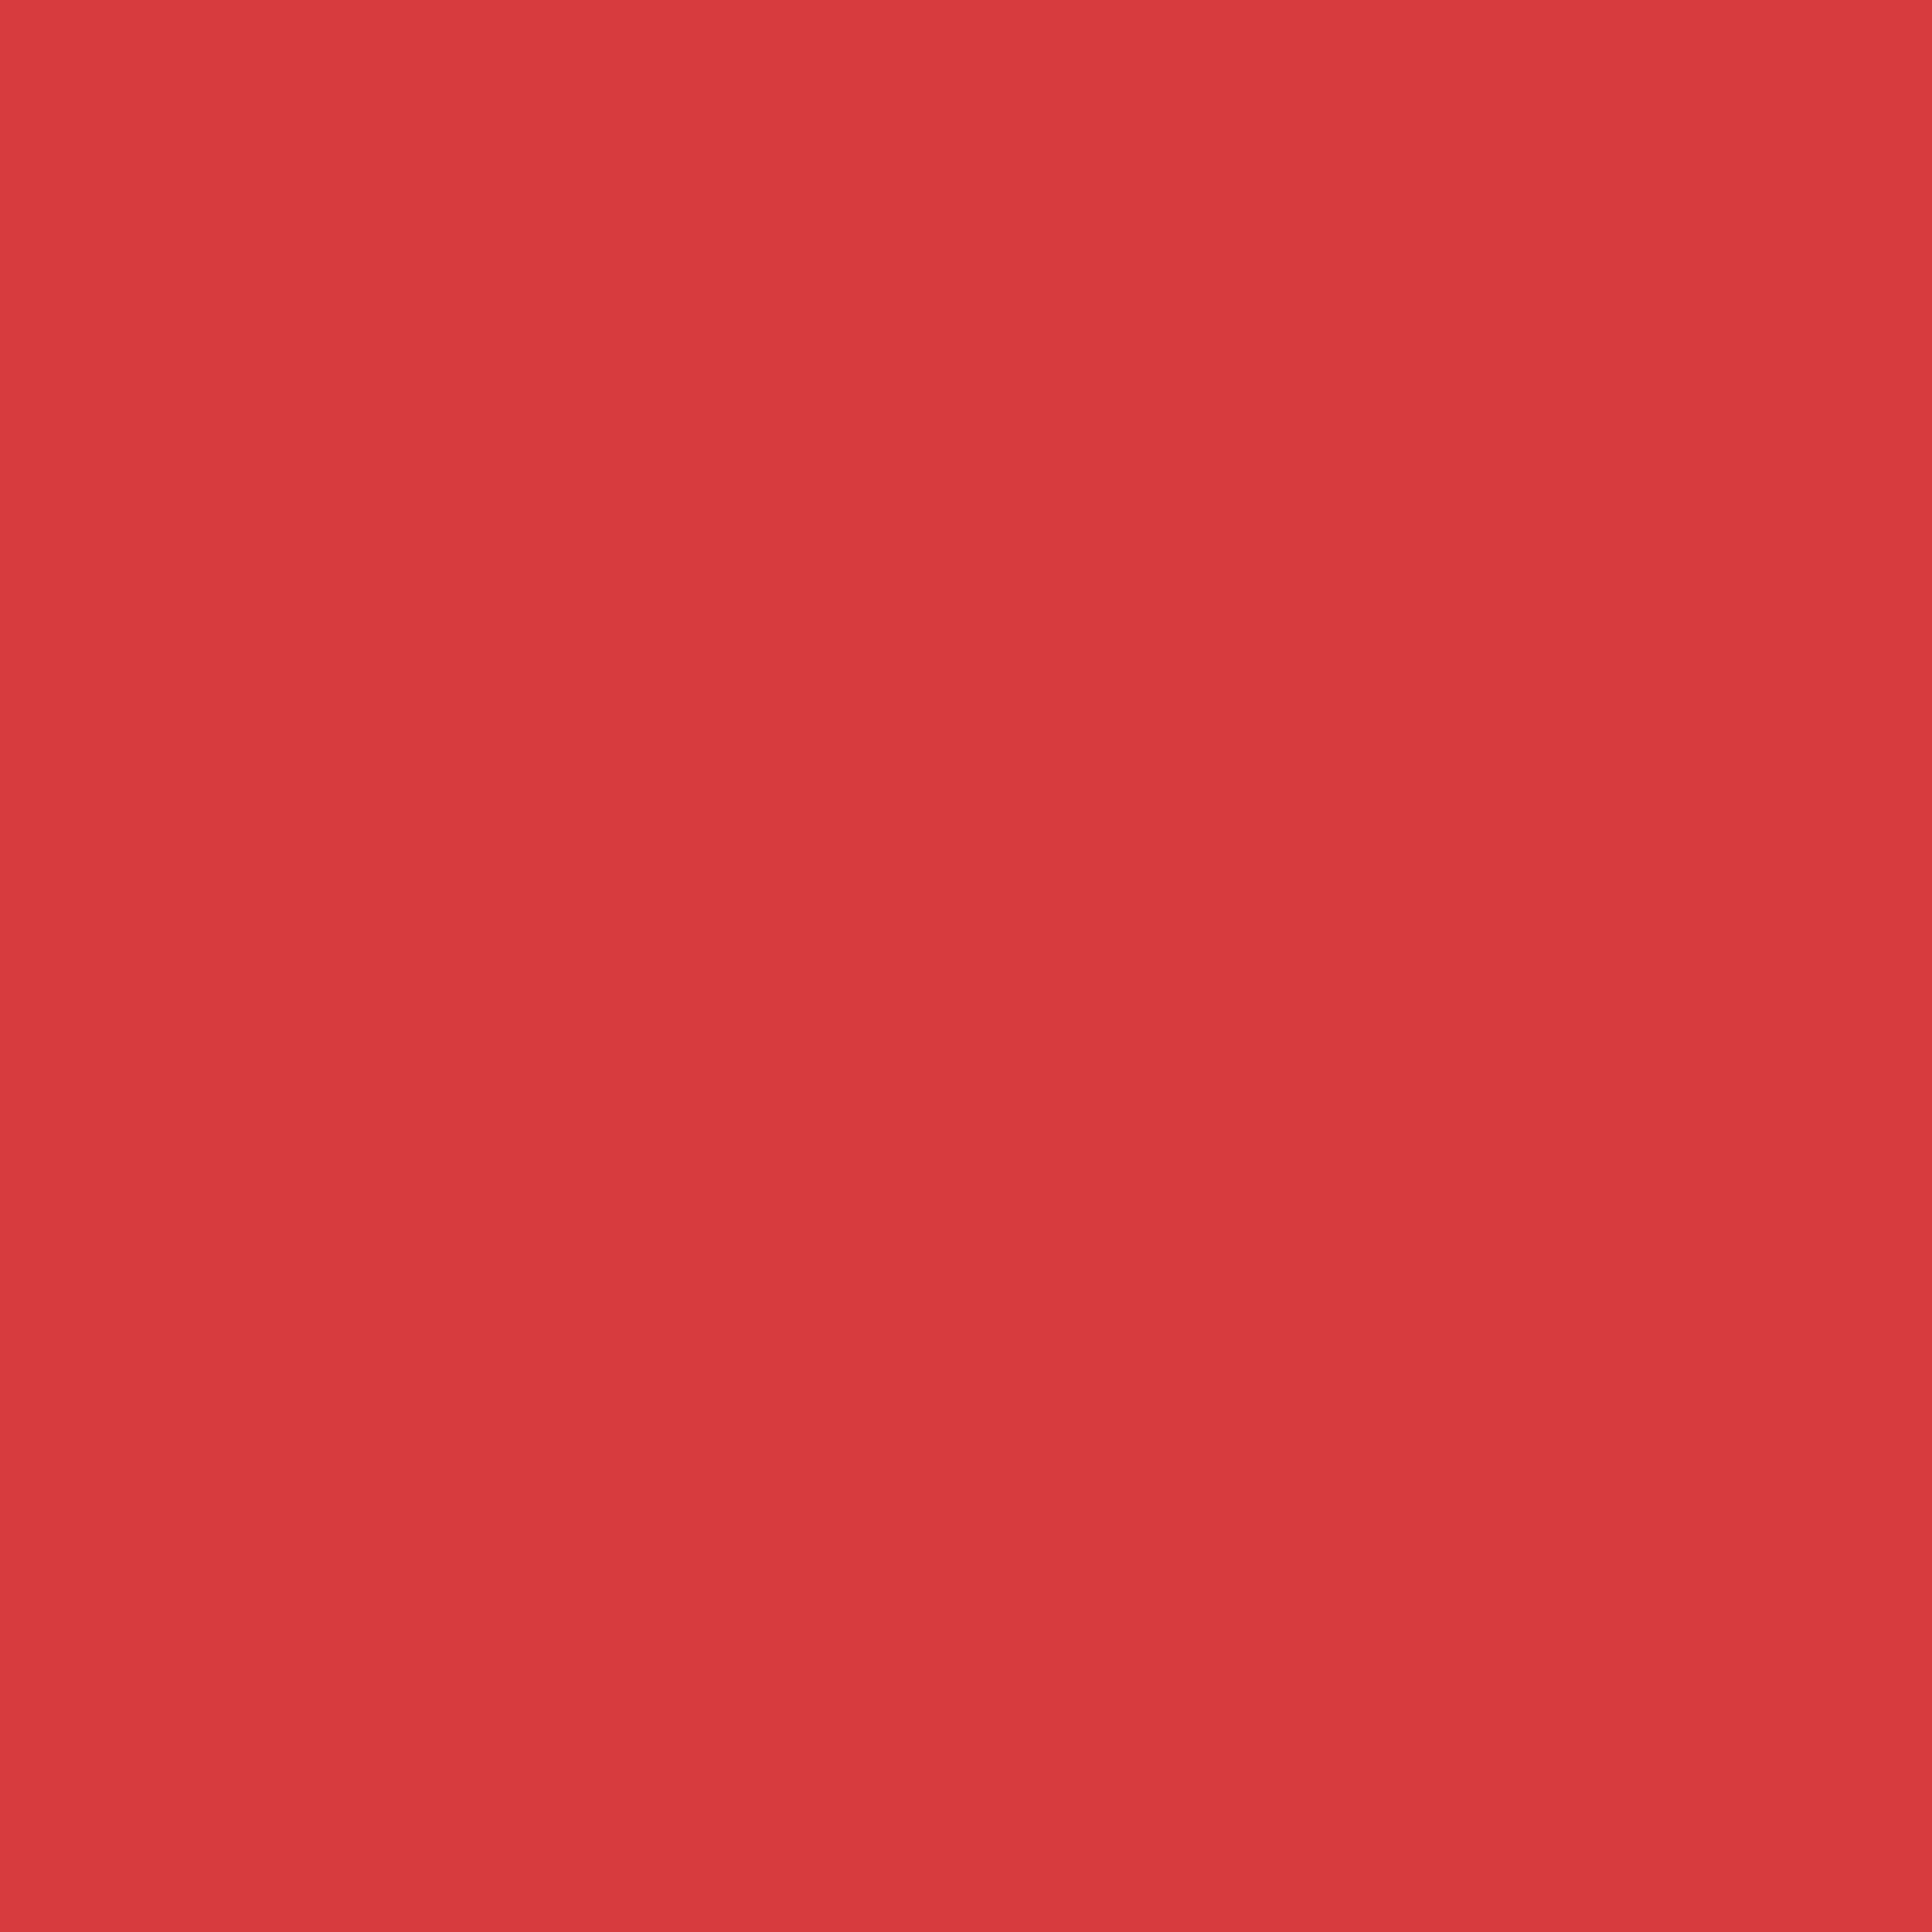 2732x2732 Jasper Solid Color Background